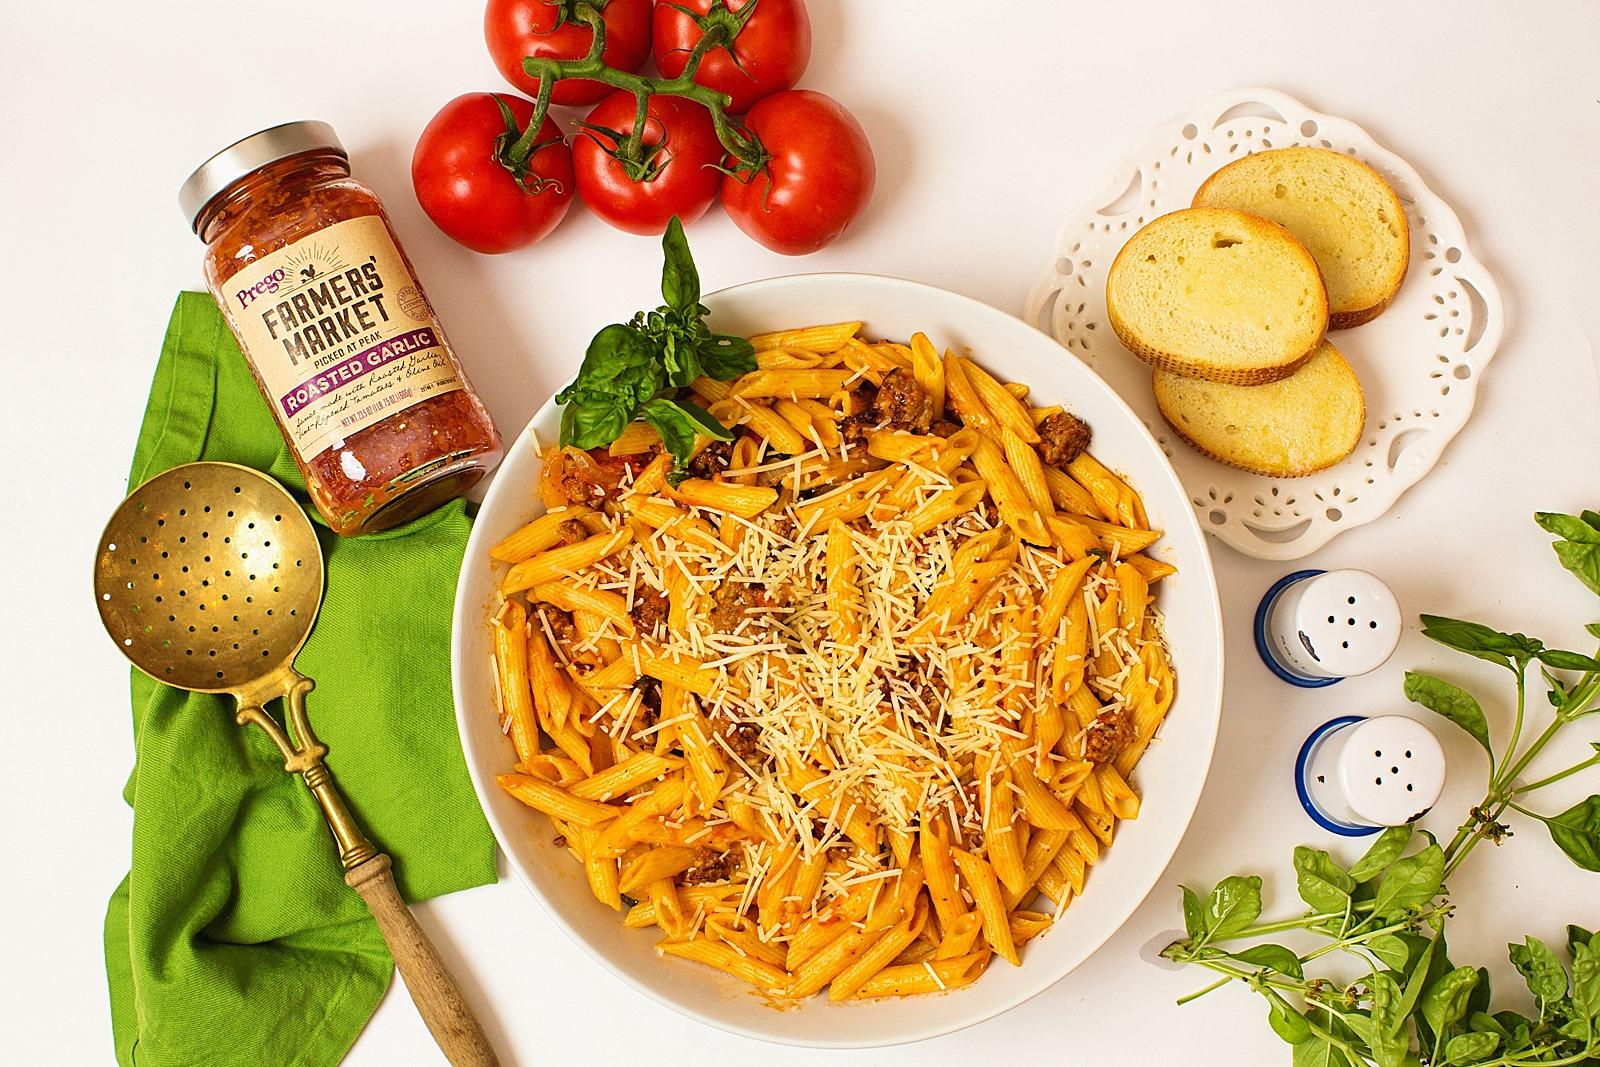 prego-farmers-market-recipe-penne-italian-sausage-basil-345